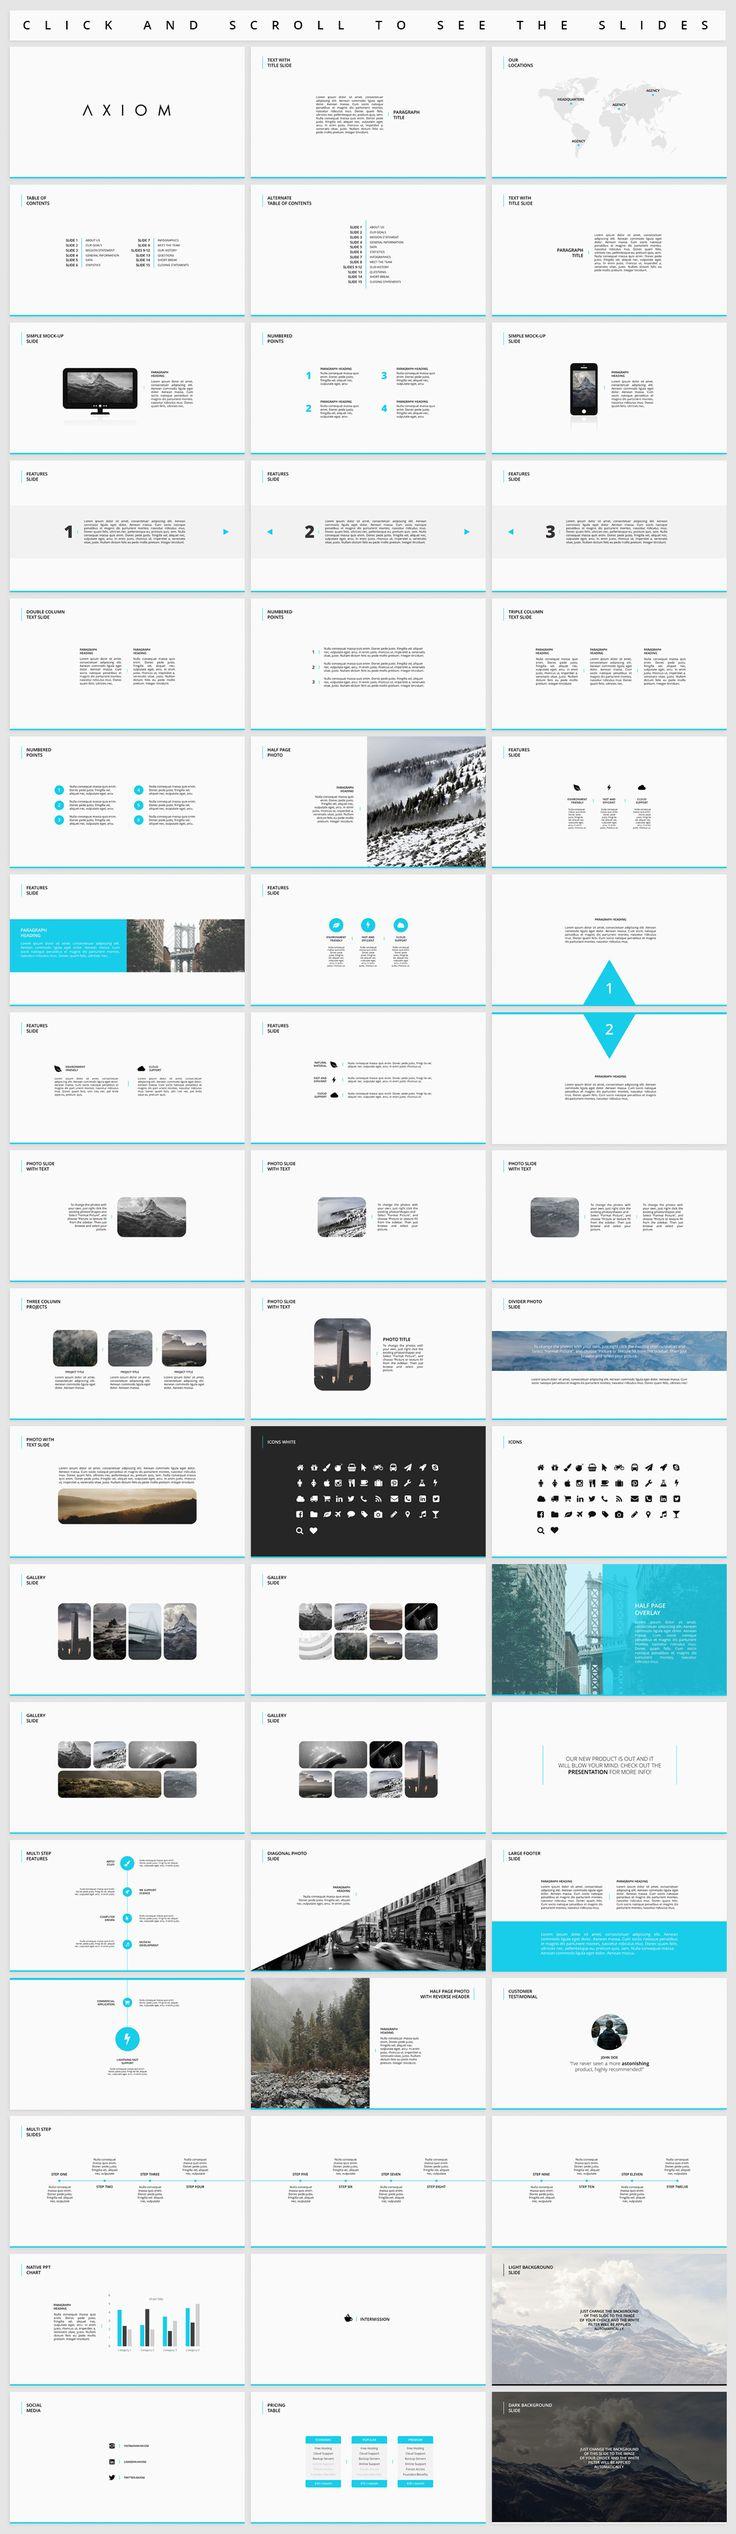 Axiom - Simple Presentation by Tugcu Design Co. on @creativemarket